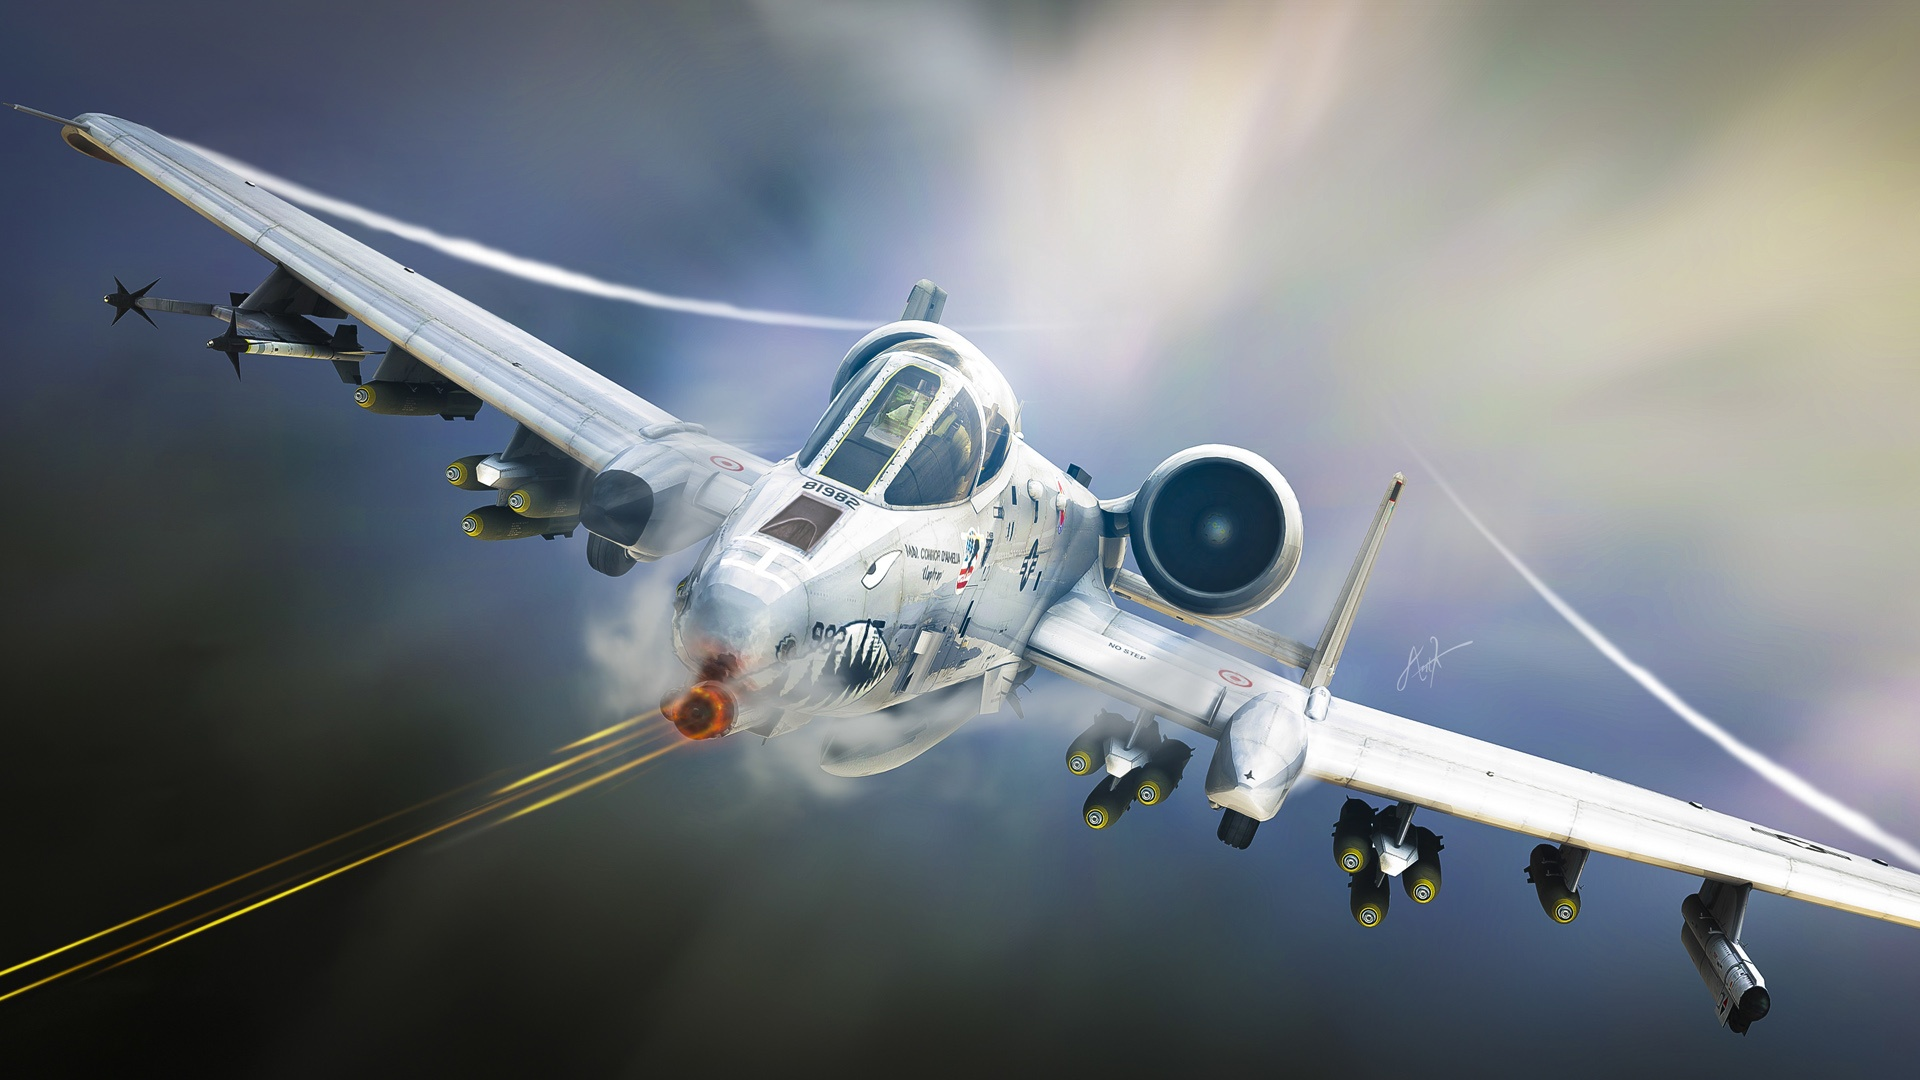 [Year of Evil] La chute de Coast City [LIBRE] A-10-Tankbuster-attack-aircraft-airplane-art-design_1920x1080